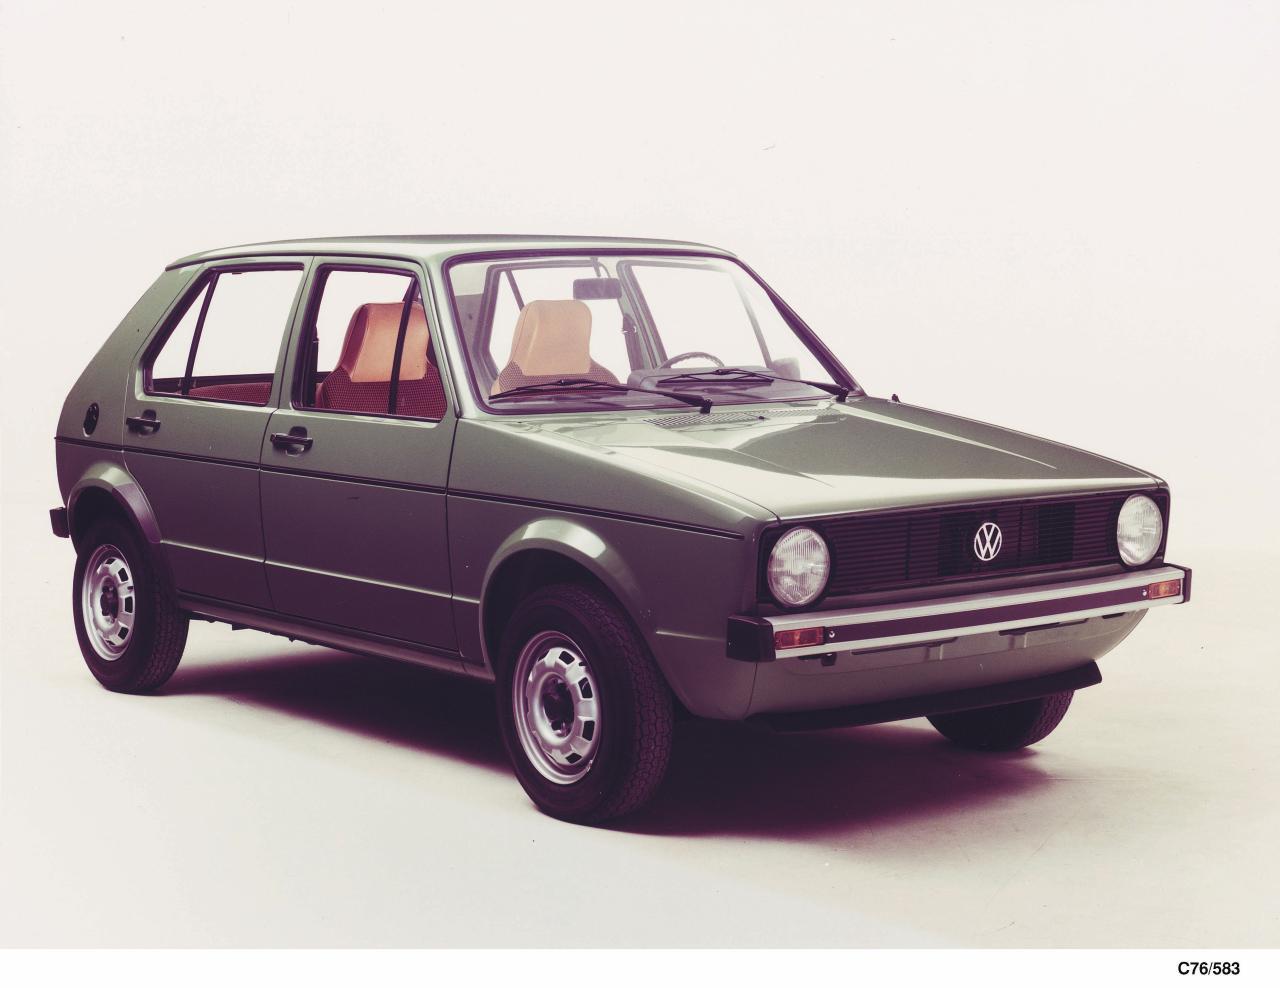 revista coche historia del volkswagen golf y del golf gti. Black Bedroom Furniture Sets. Home Design Ideas